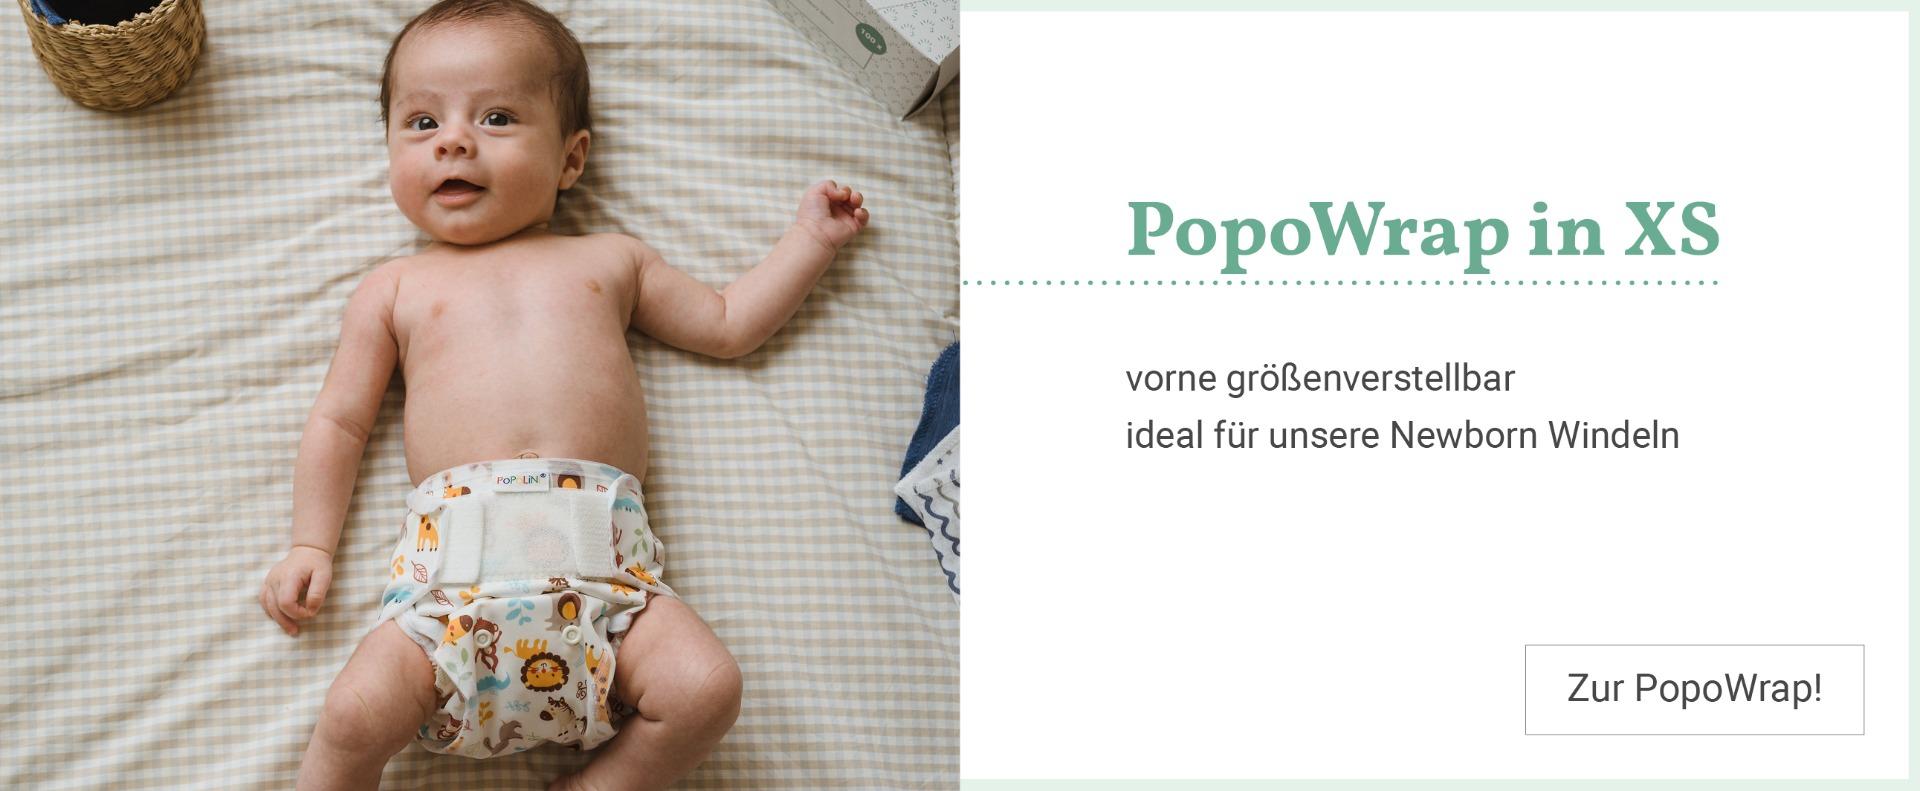 PopoWrap